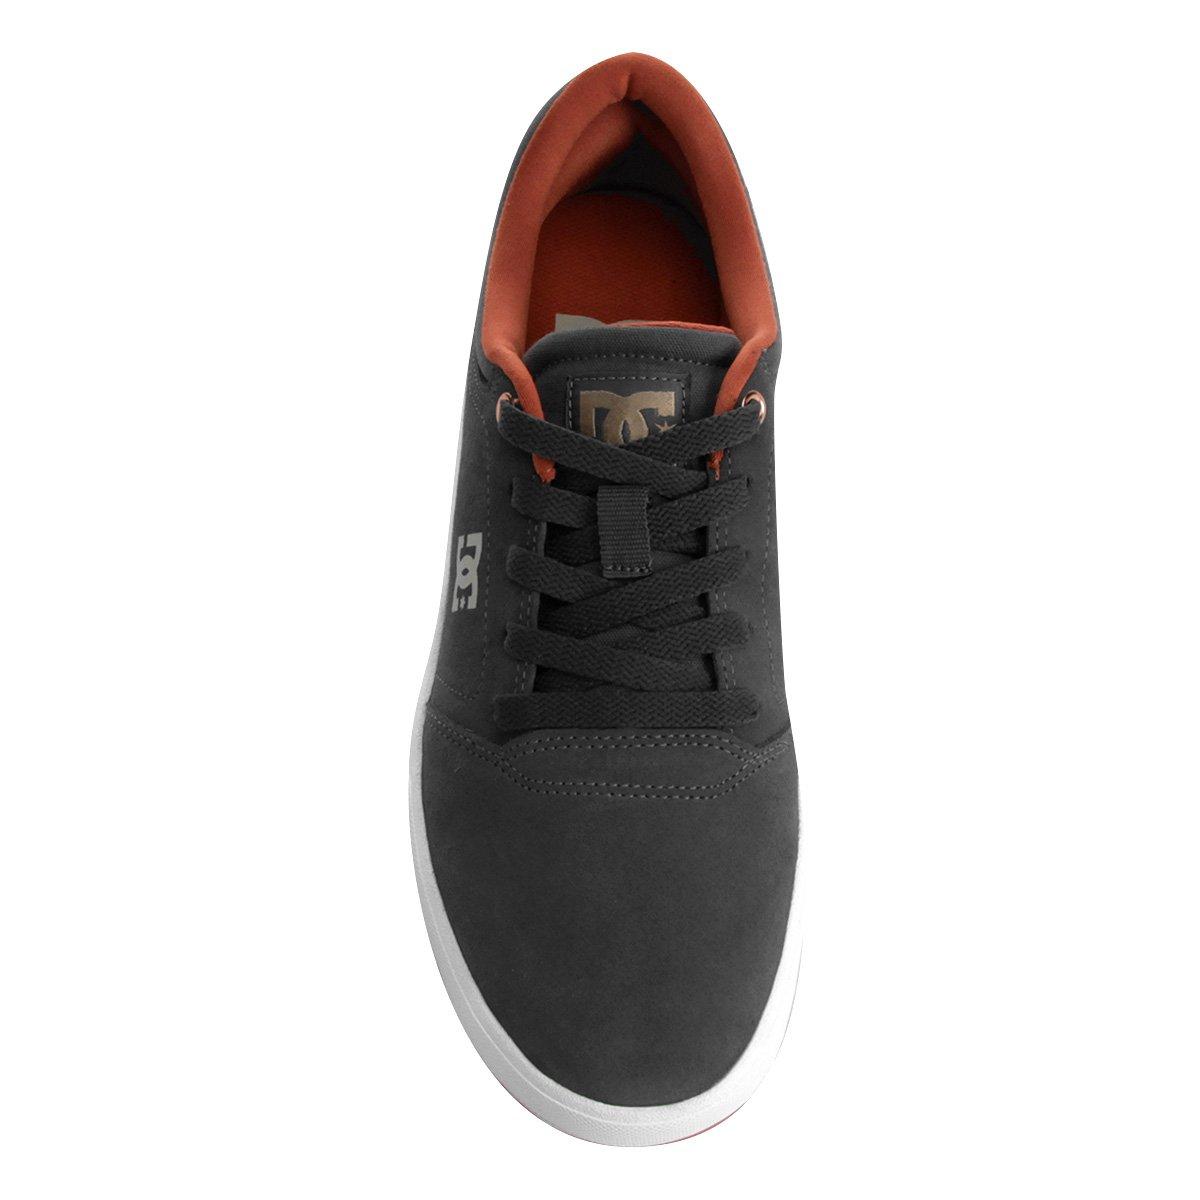 Tênis Dc Shoes Crisis LA Masculino - Cinza e Branco - Compre Agora ... 87eb6e582b737